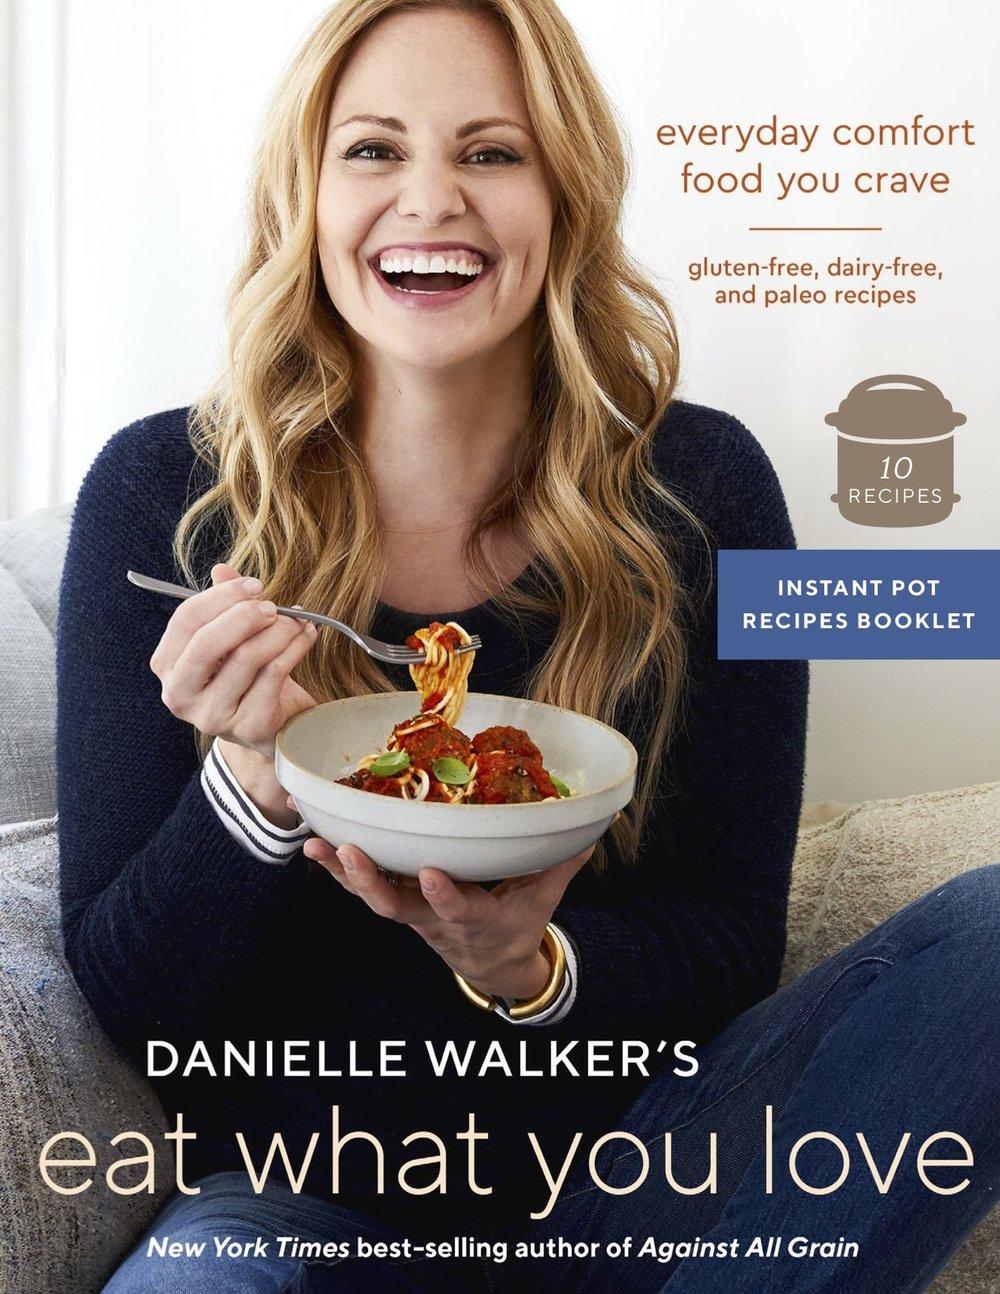 Danielle Walker Exclusive  Instant Pot Booklet Cover.jpg